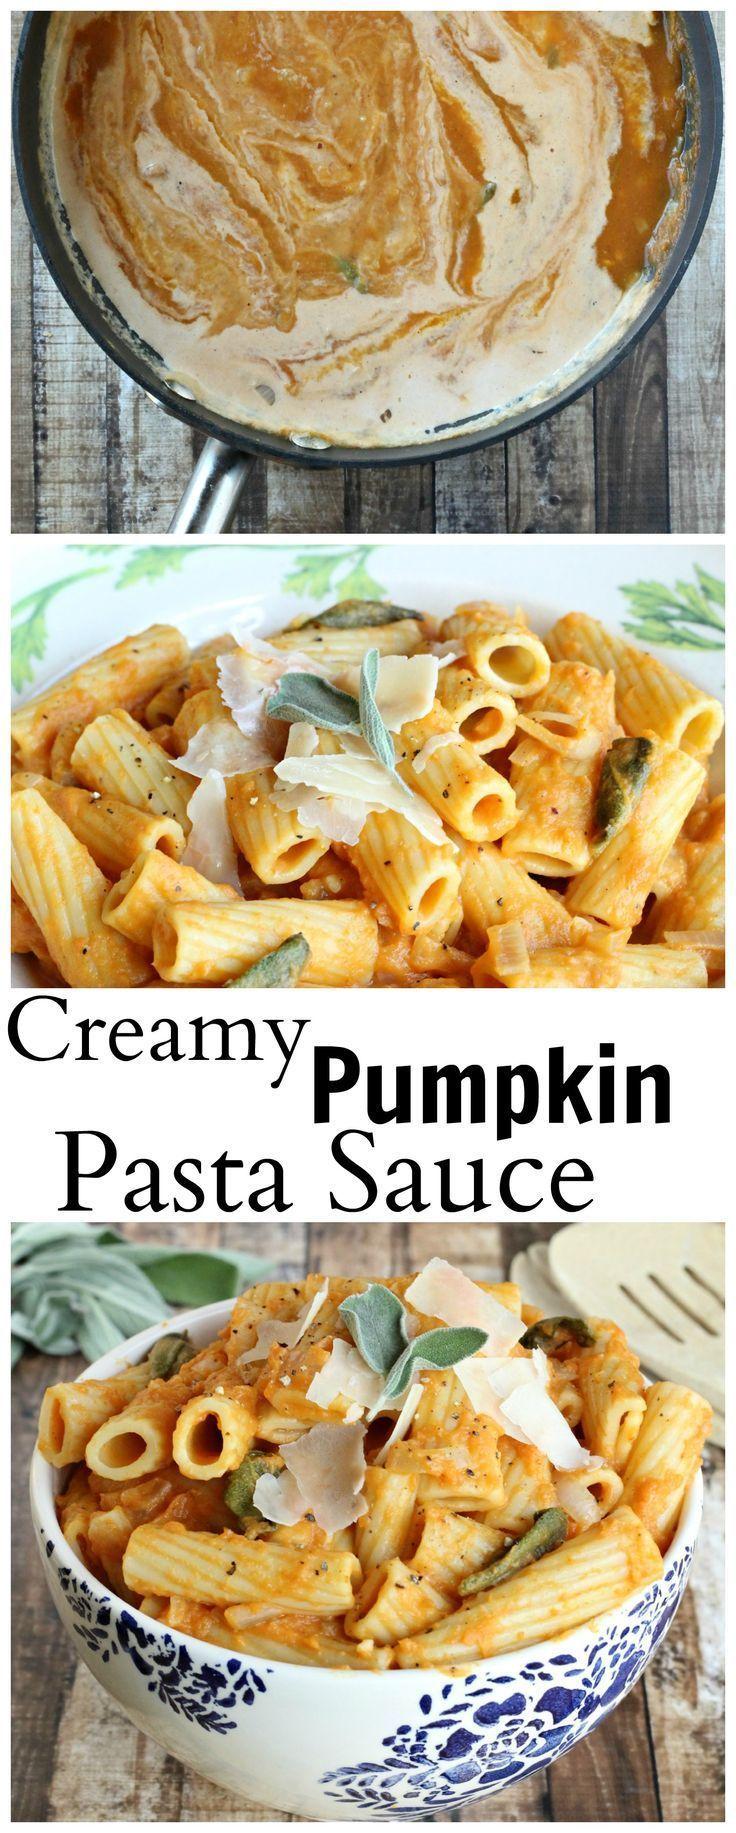 Healthy Pumpkin Pasta Sauce